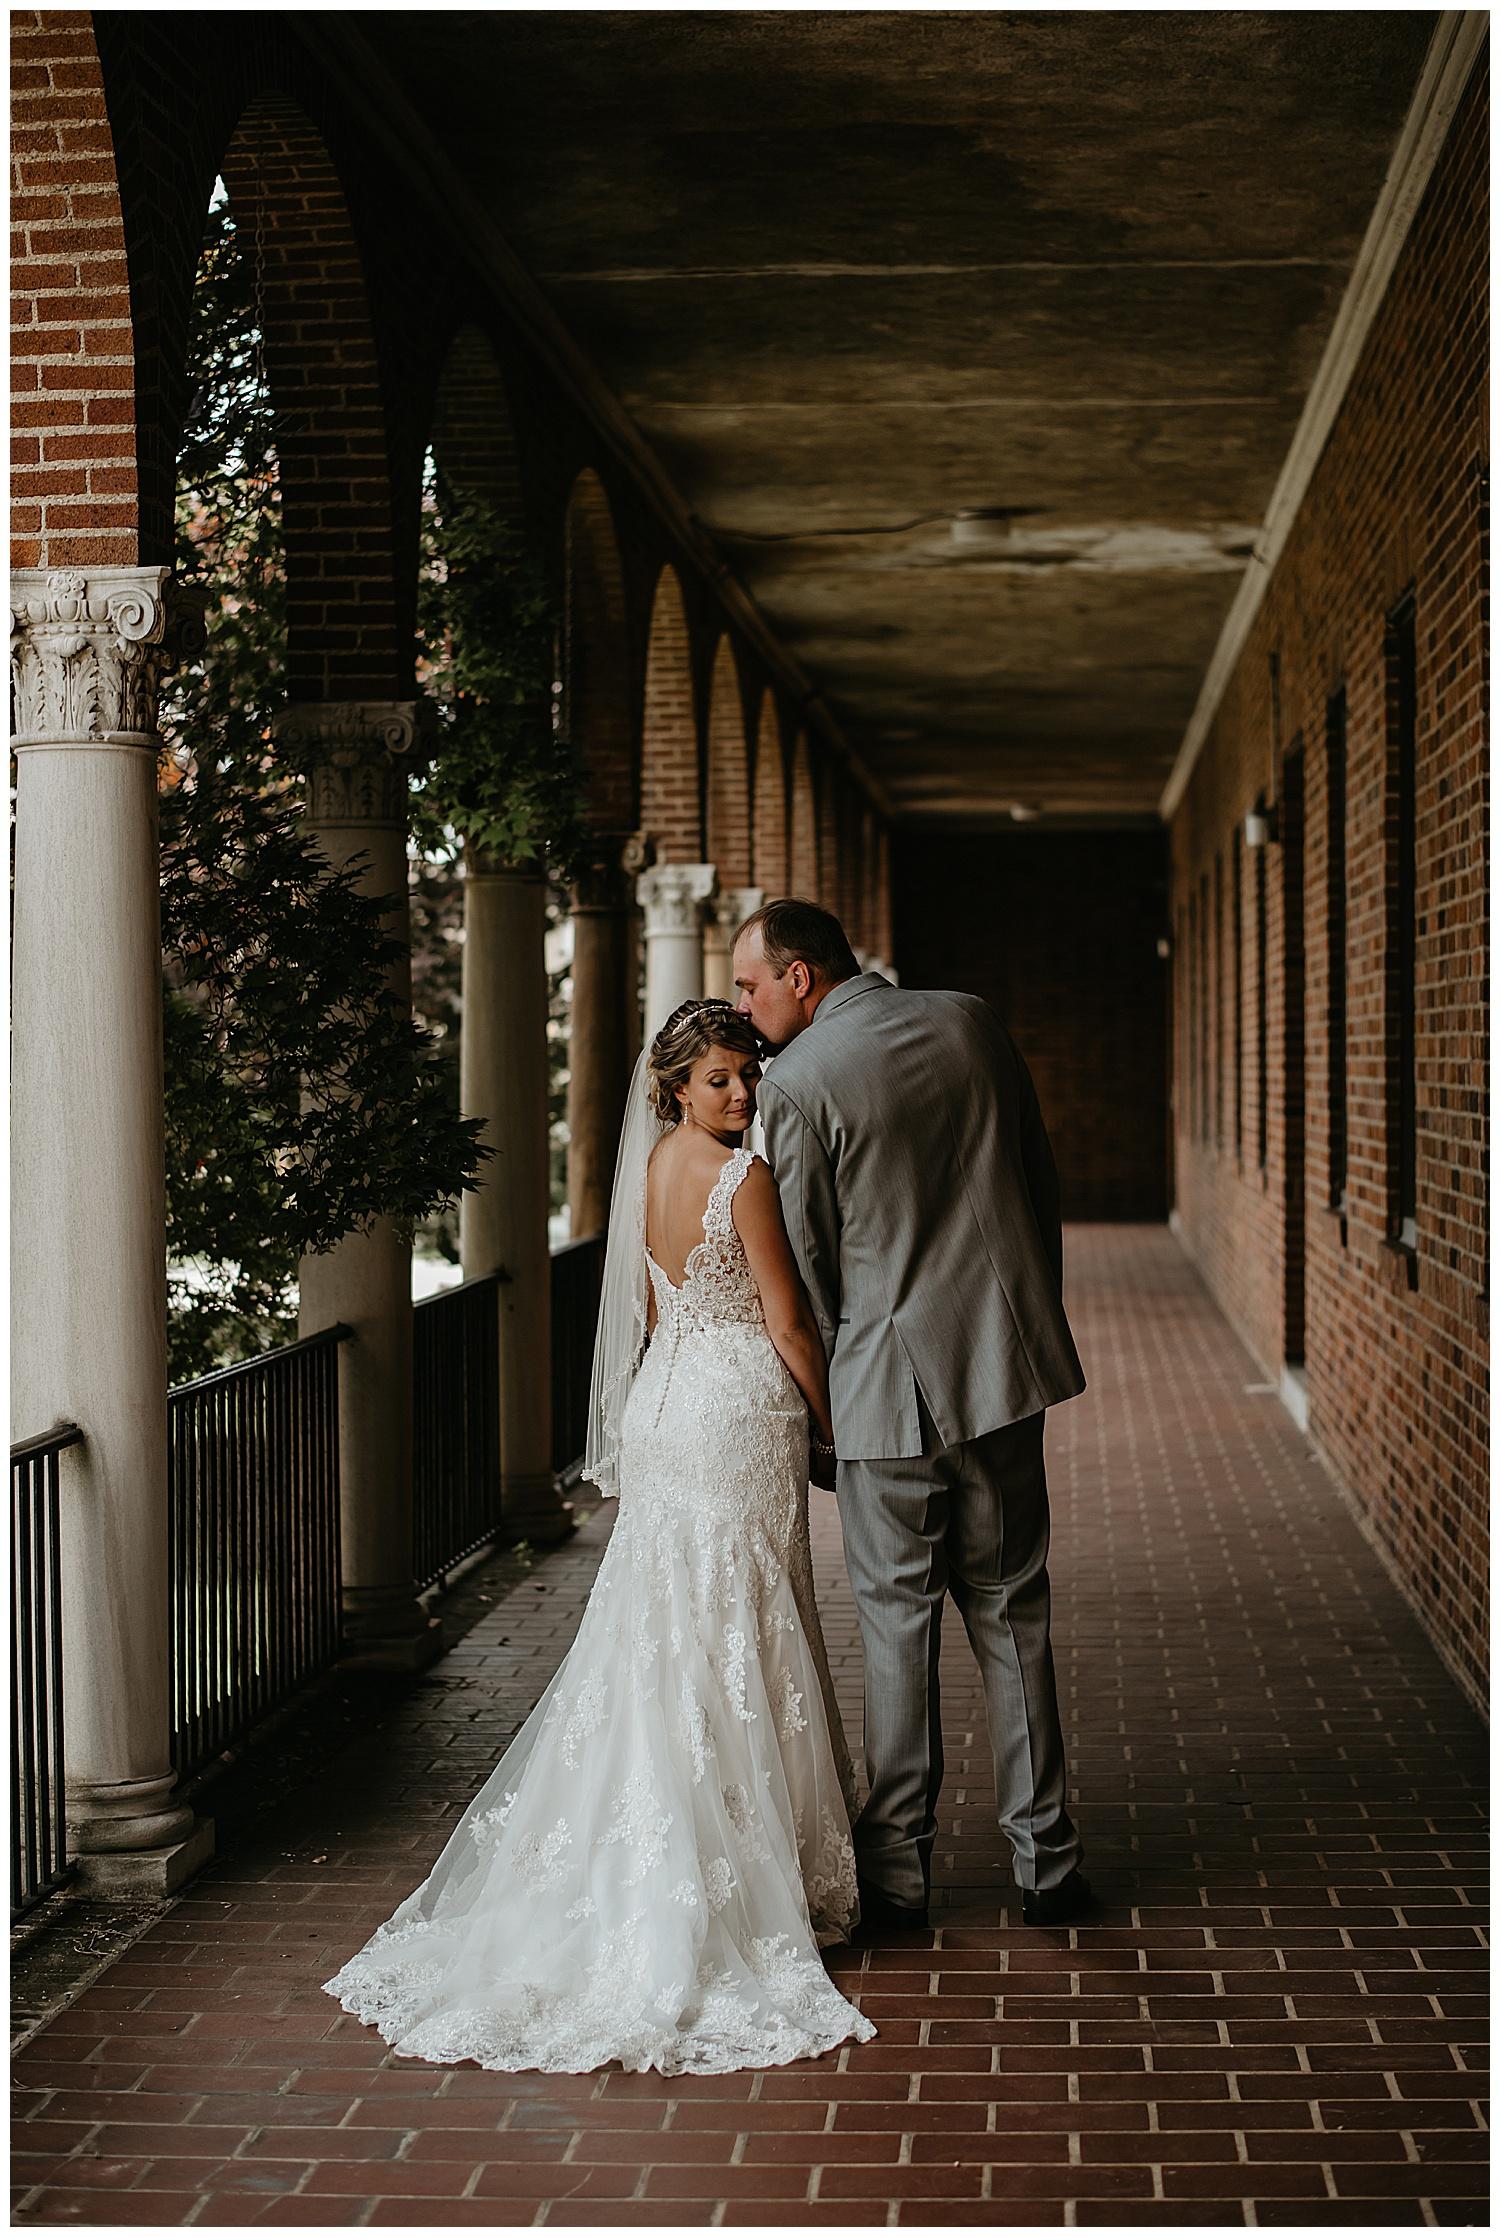 NEPA-Lehigh-Valley-Wedding-Photographer-at-Fountain-Springs-Country-Inn-Ashland-PA_0044.jpg